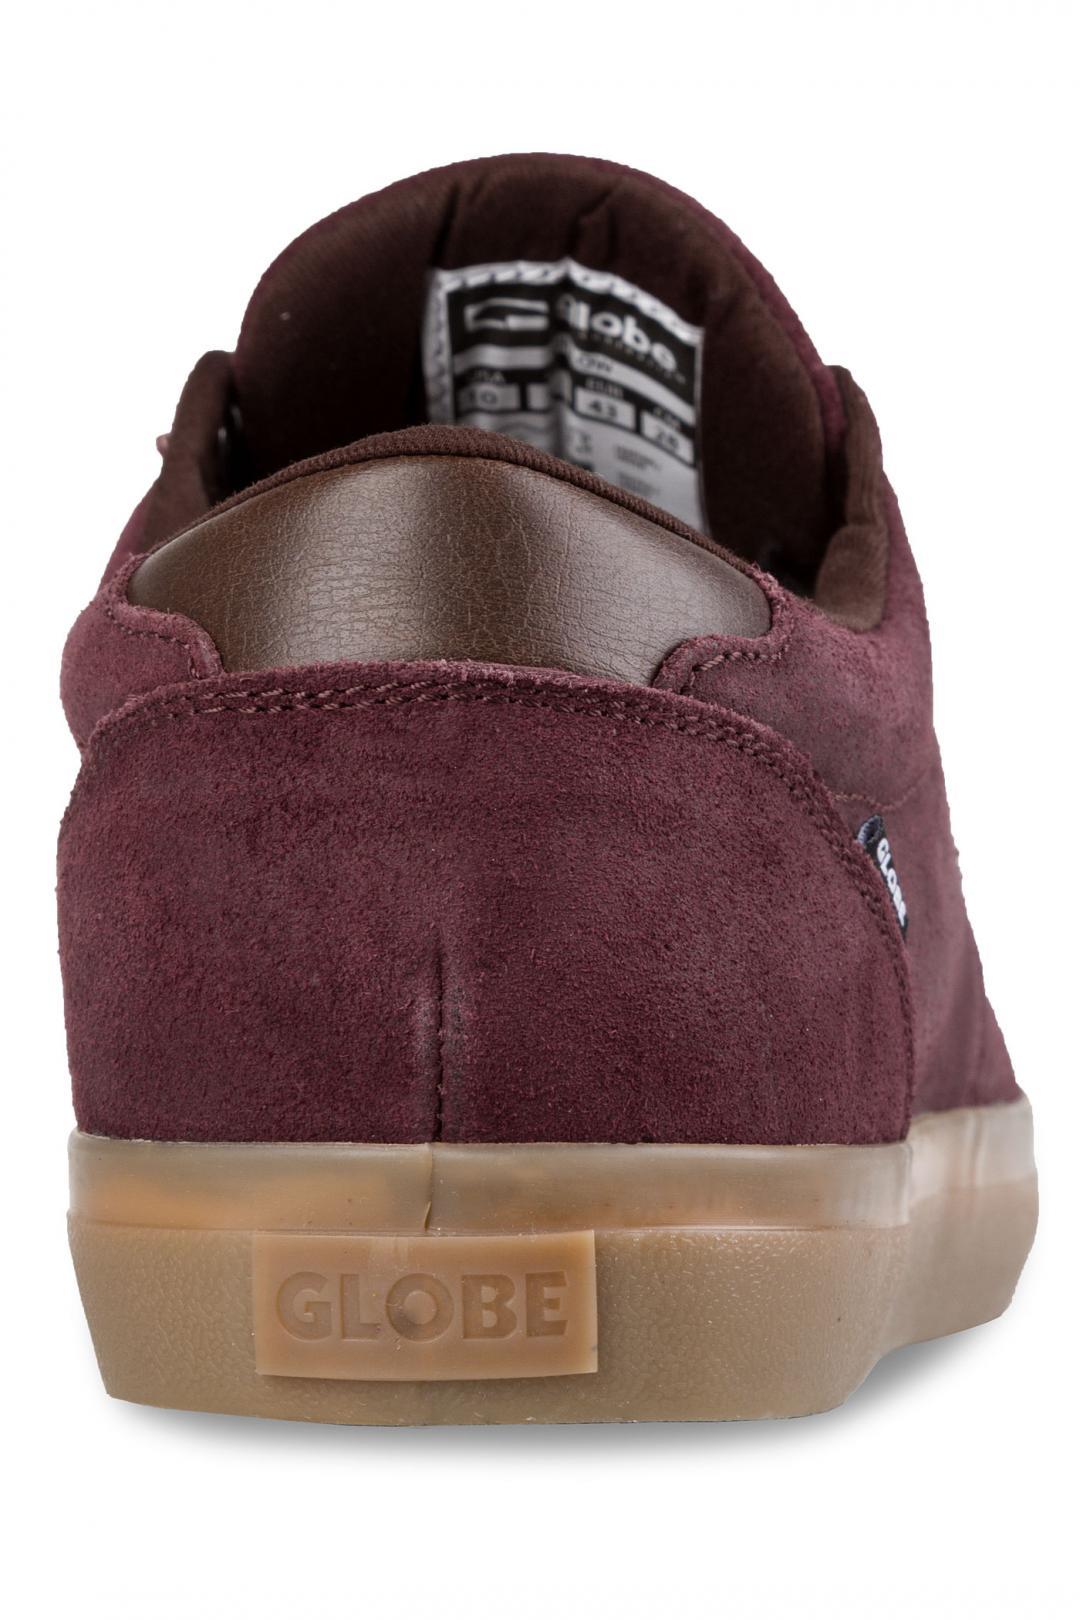 Uomo Globe Willow rum raisin gum | Sneaker